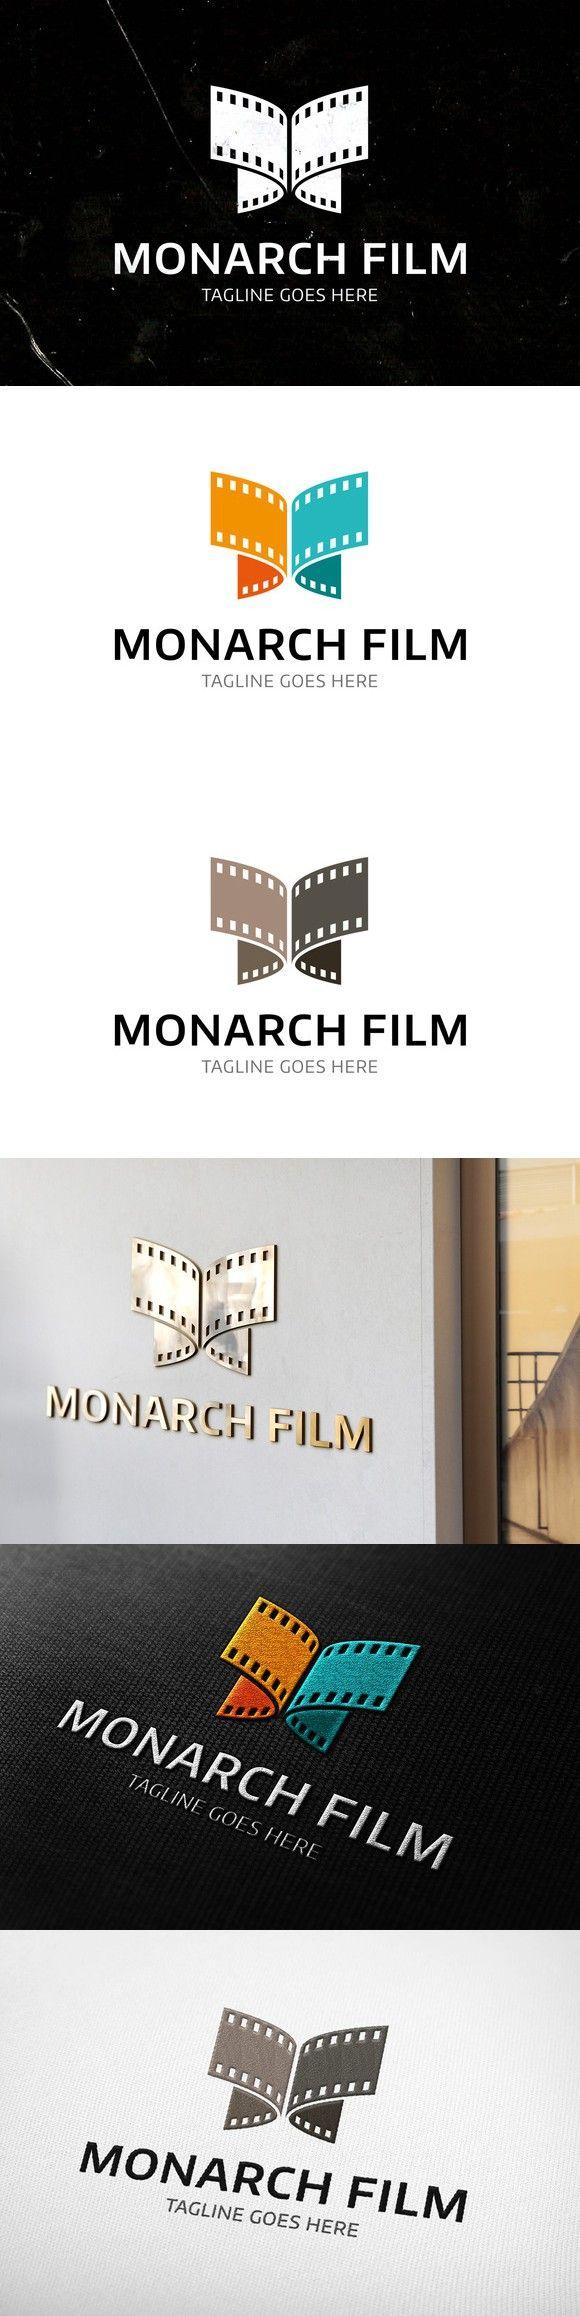 Monarch Film Logo Template. Logo Templates. $25.00